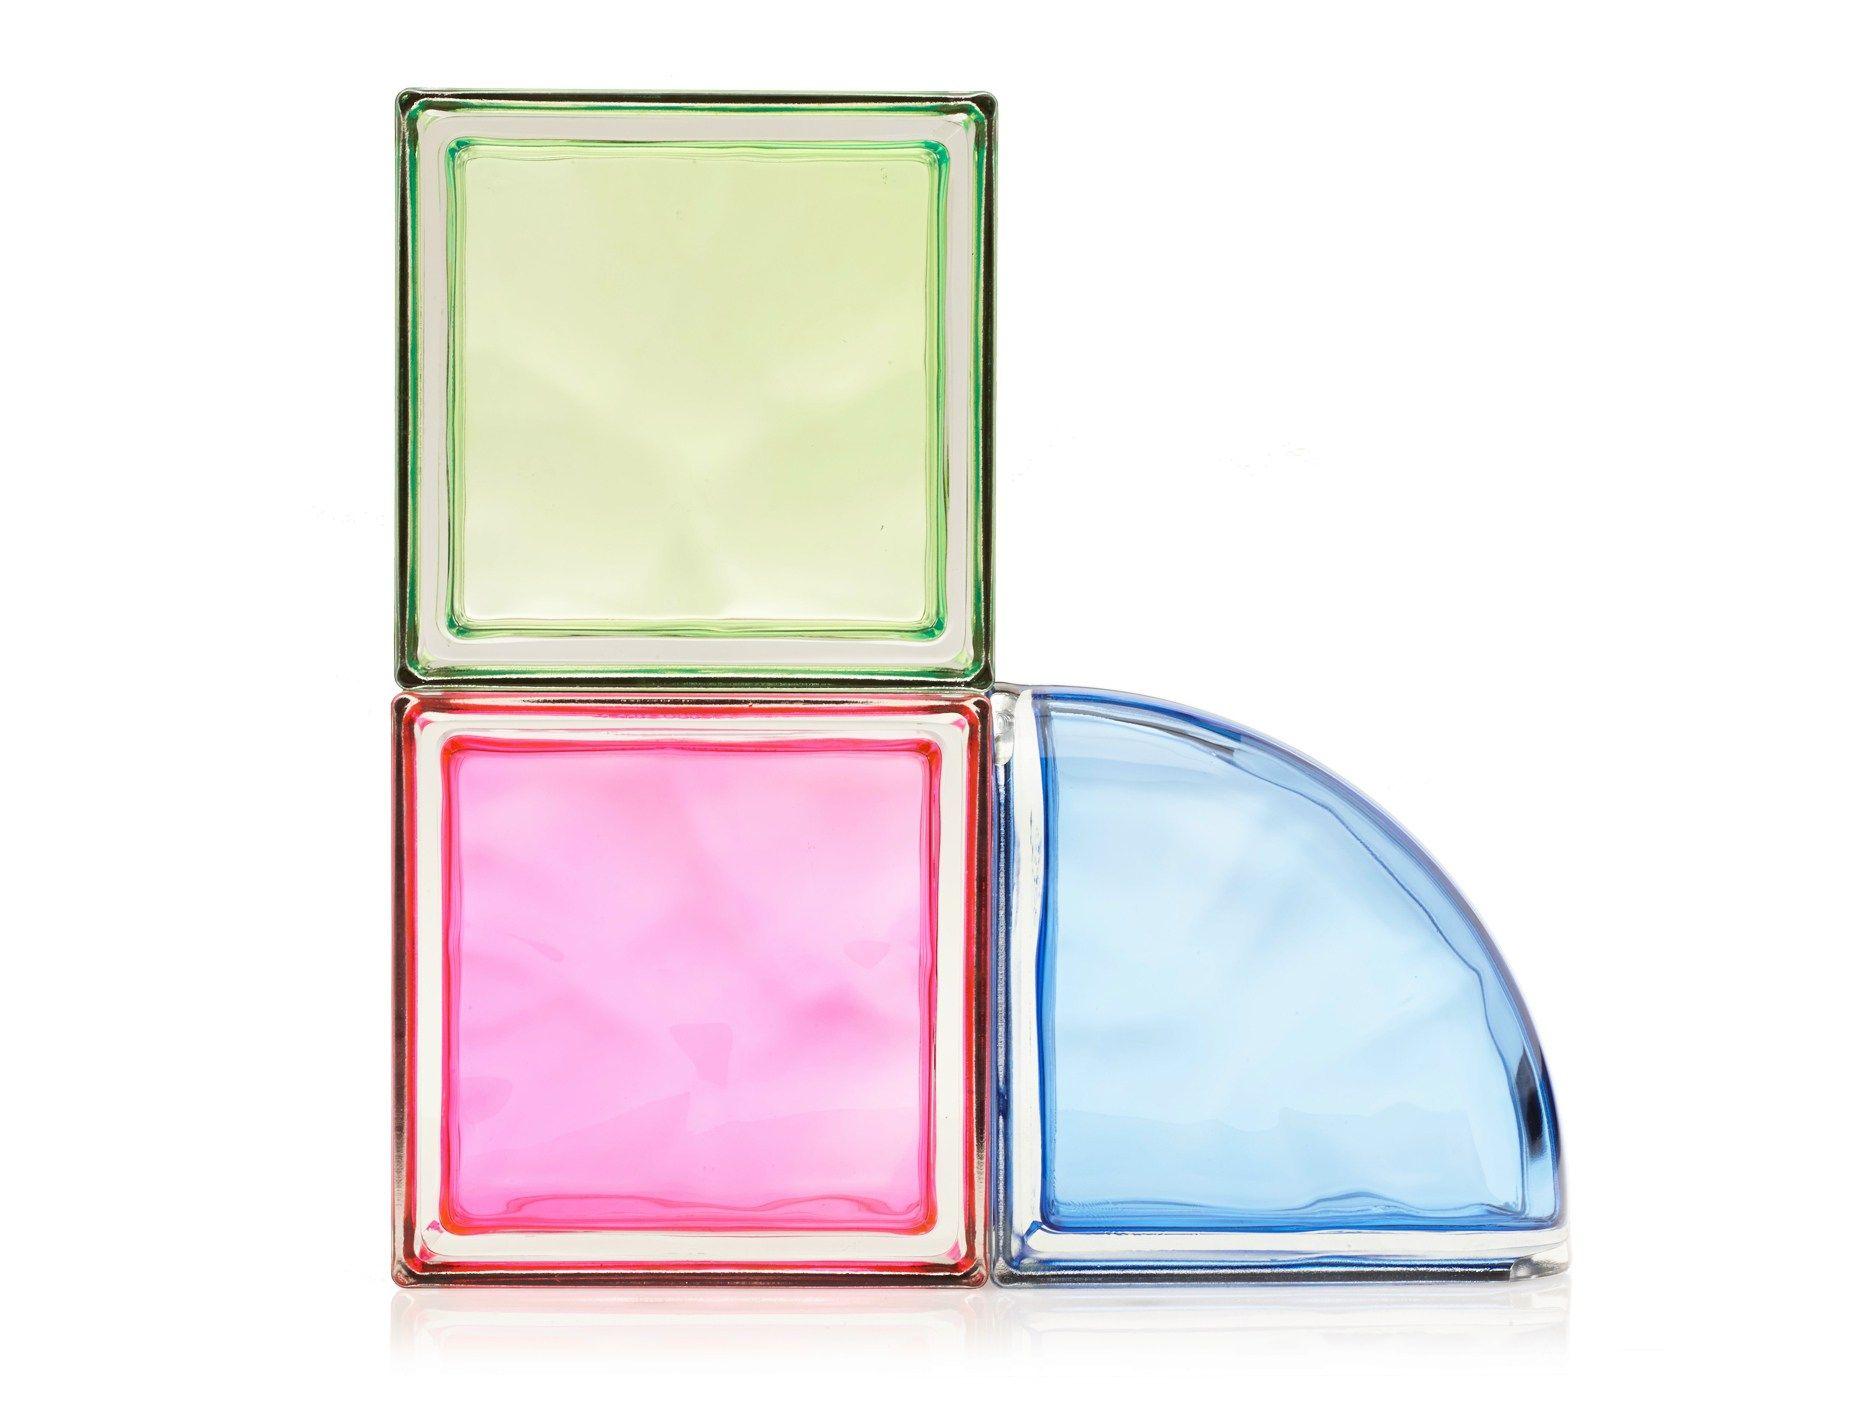 Brique de verre color new colour by seves divisione for Block lock brique de verre